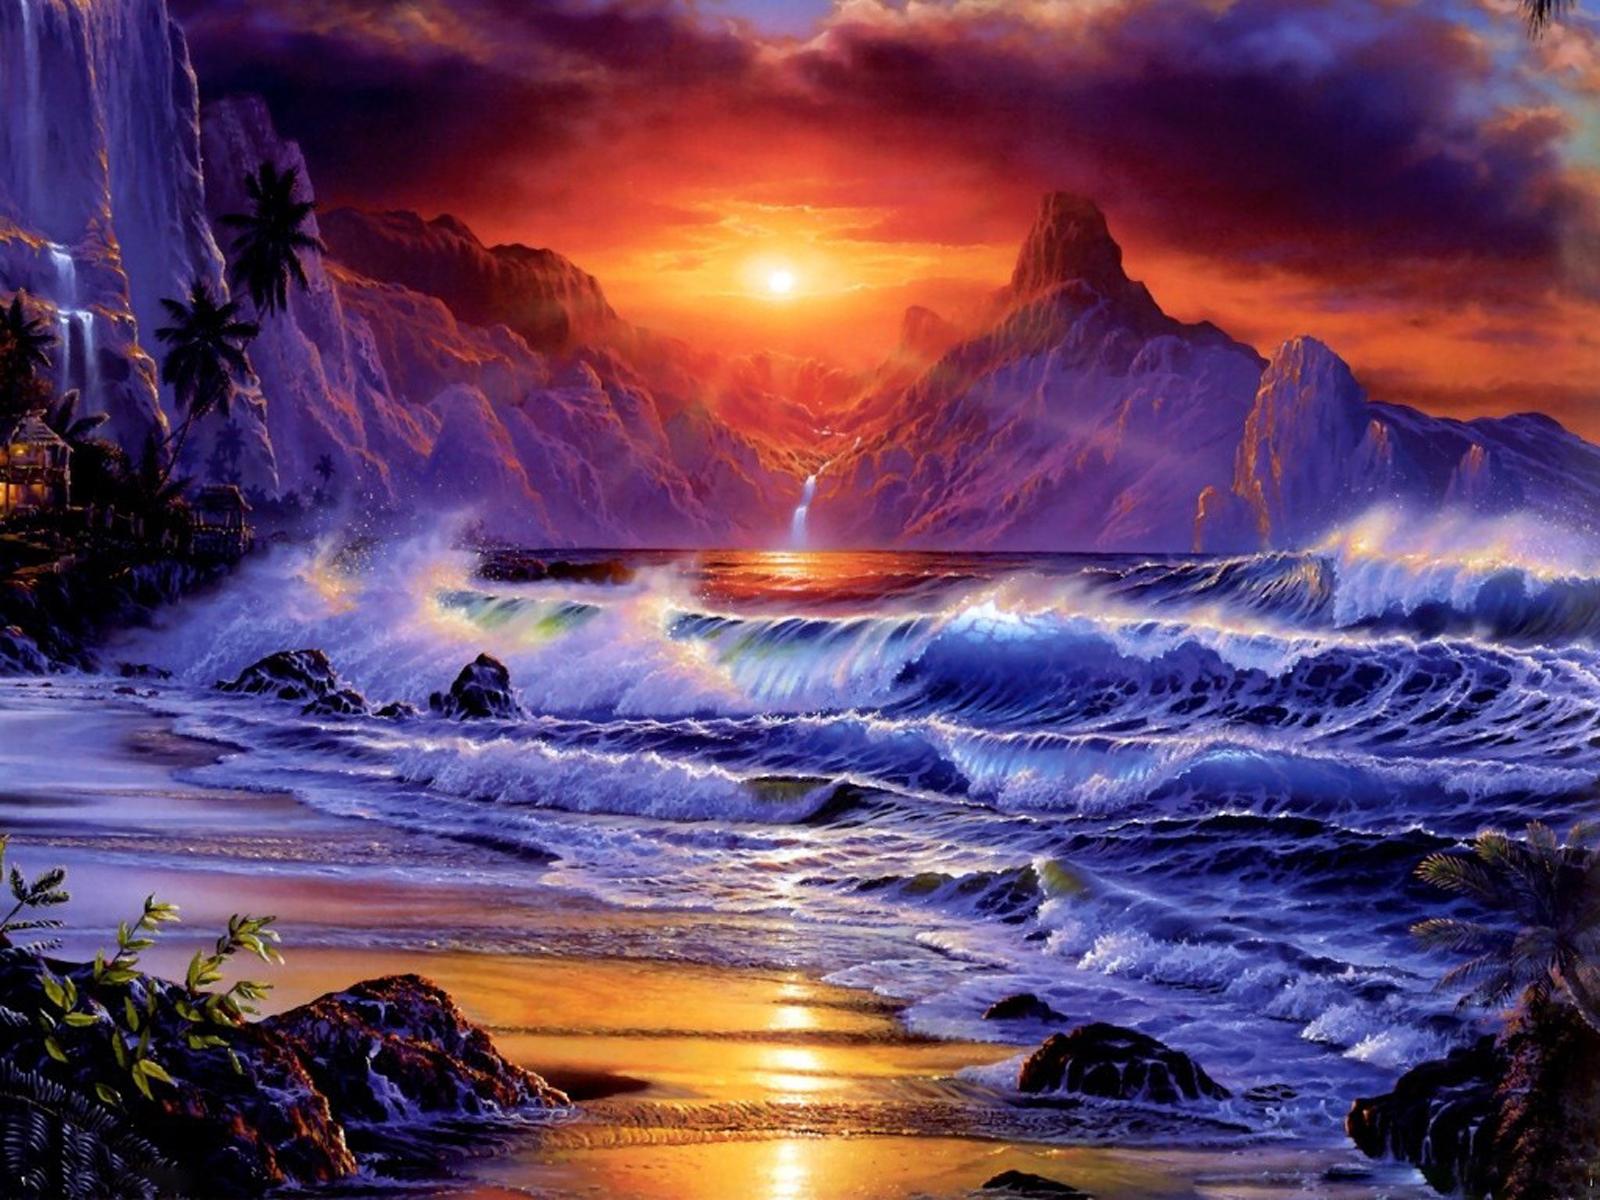 Amazing Fantasy Sunset computer desktop wallpaper 1600x1200